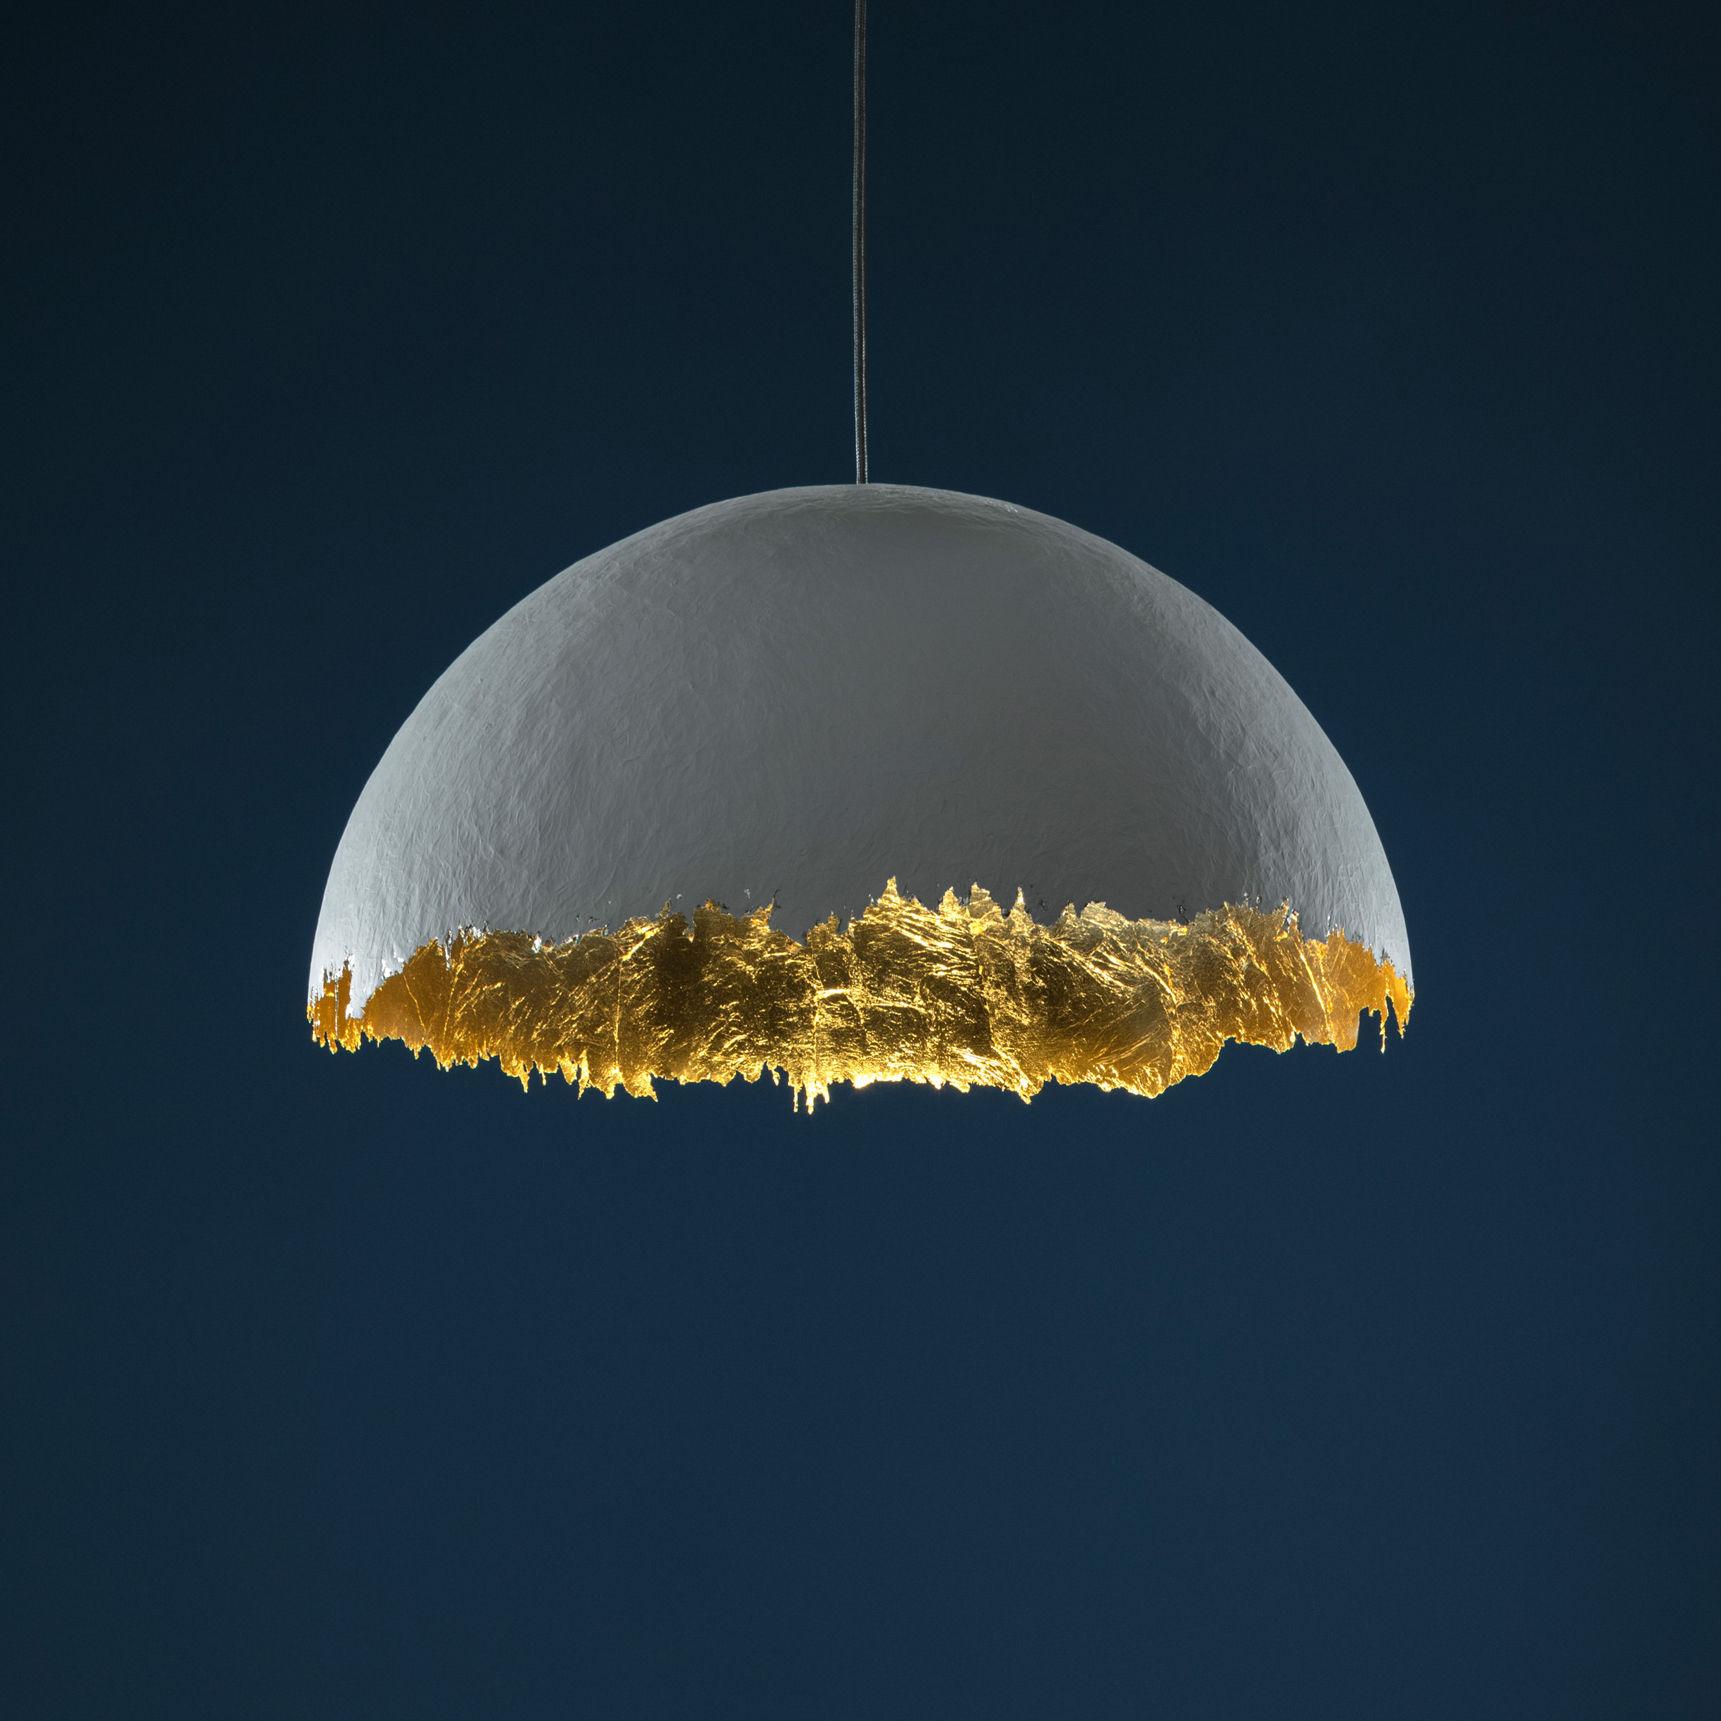 Luminaire - Suspensions - Suspension Suspension PostKrisi 49 / Ø 60 cm - Catellani & Smith - Blanc / Intérieur or - Feuille d'or, Fibre de verre